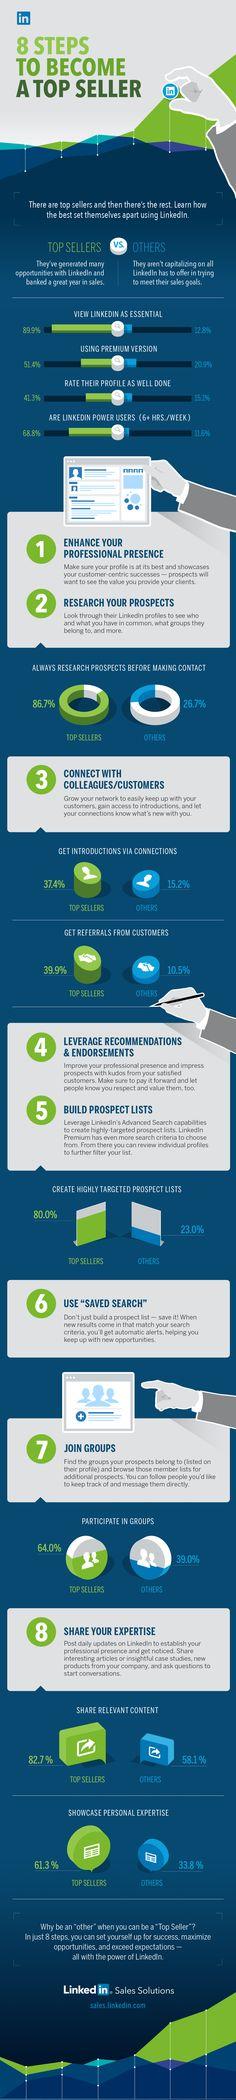 8 Steps to become a Top Seller  #SocialSelling #SocialSellingStrategies #SocialMedia   www.TopDogSocialMedia.com